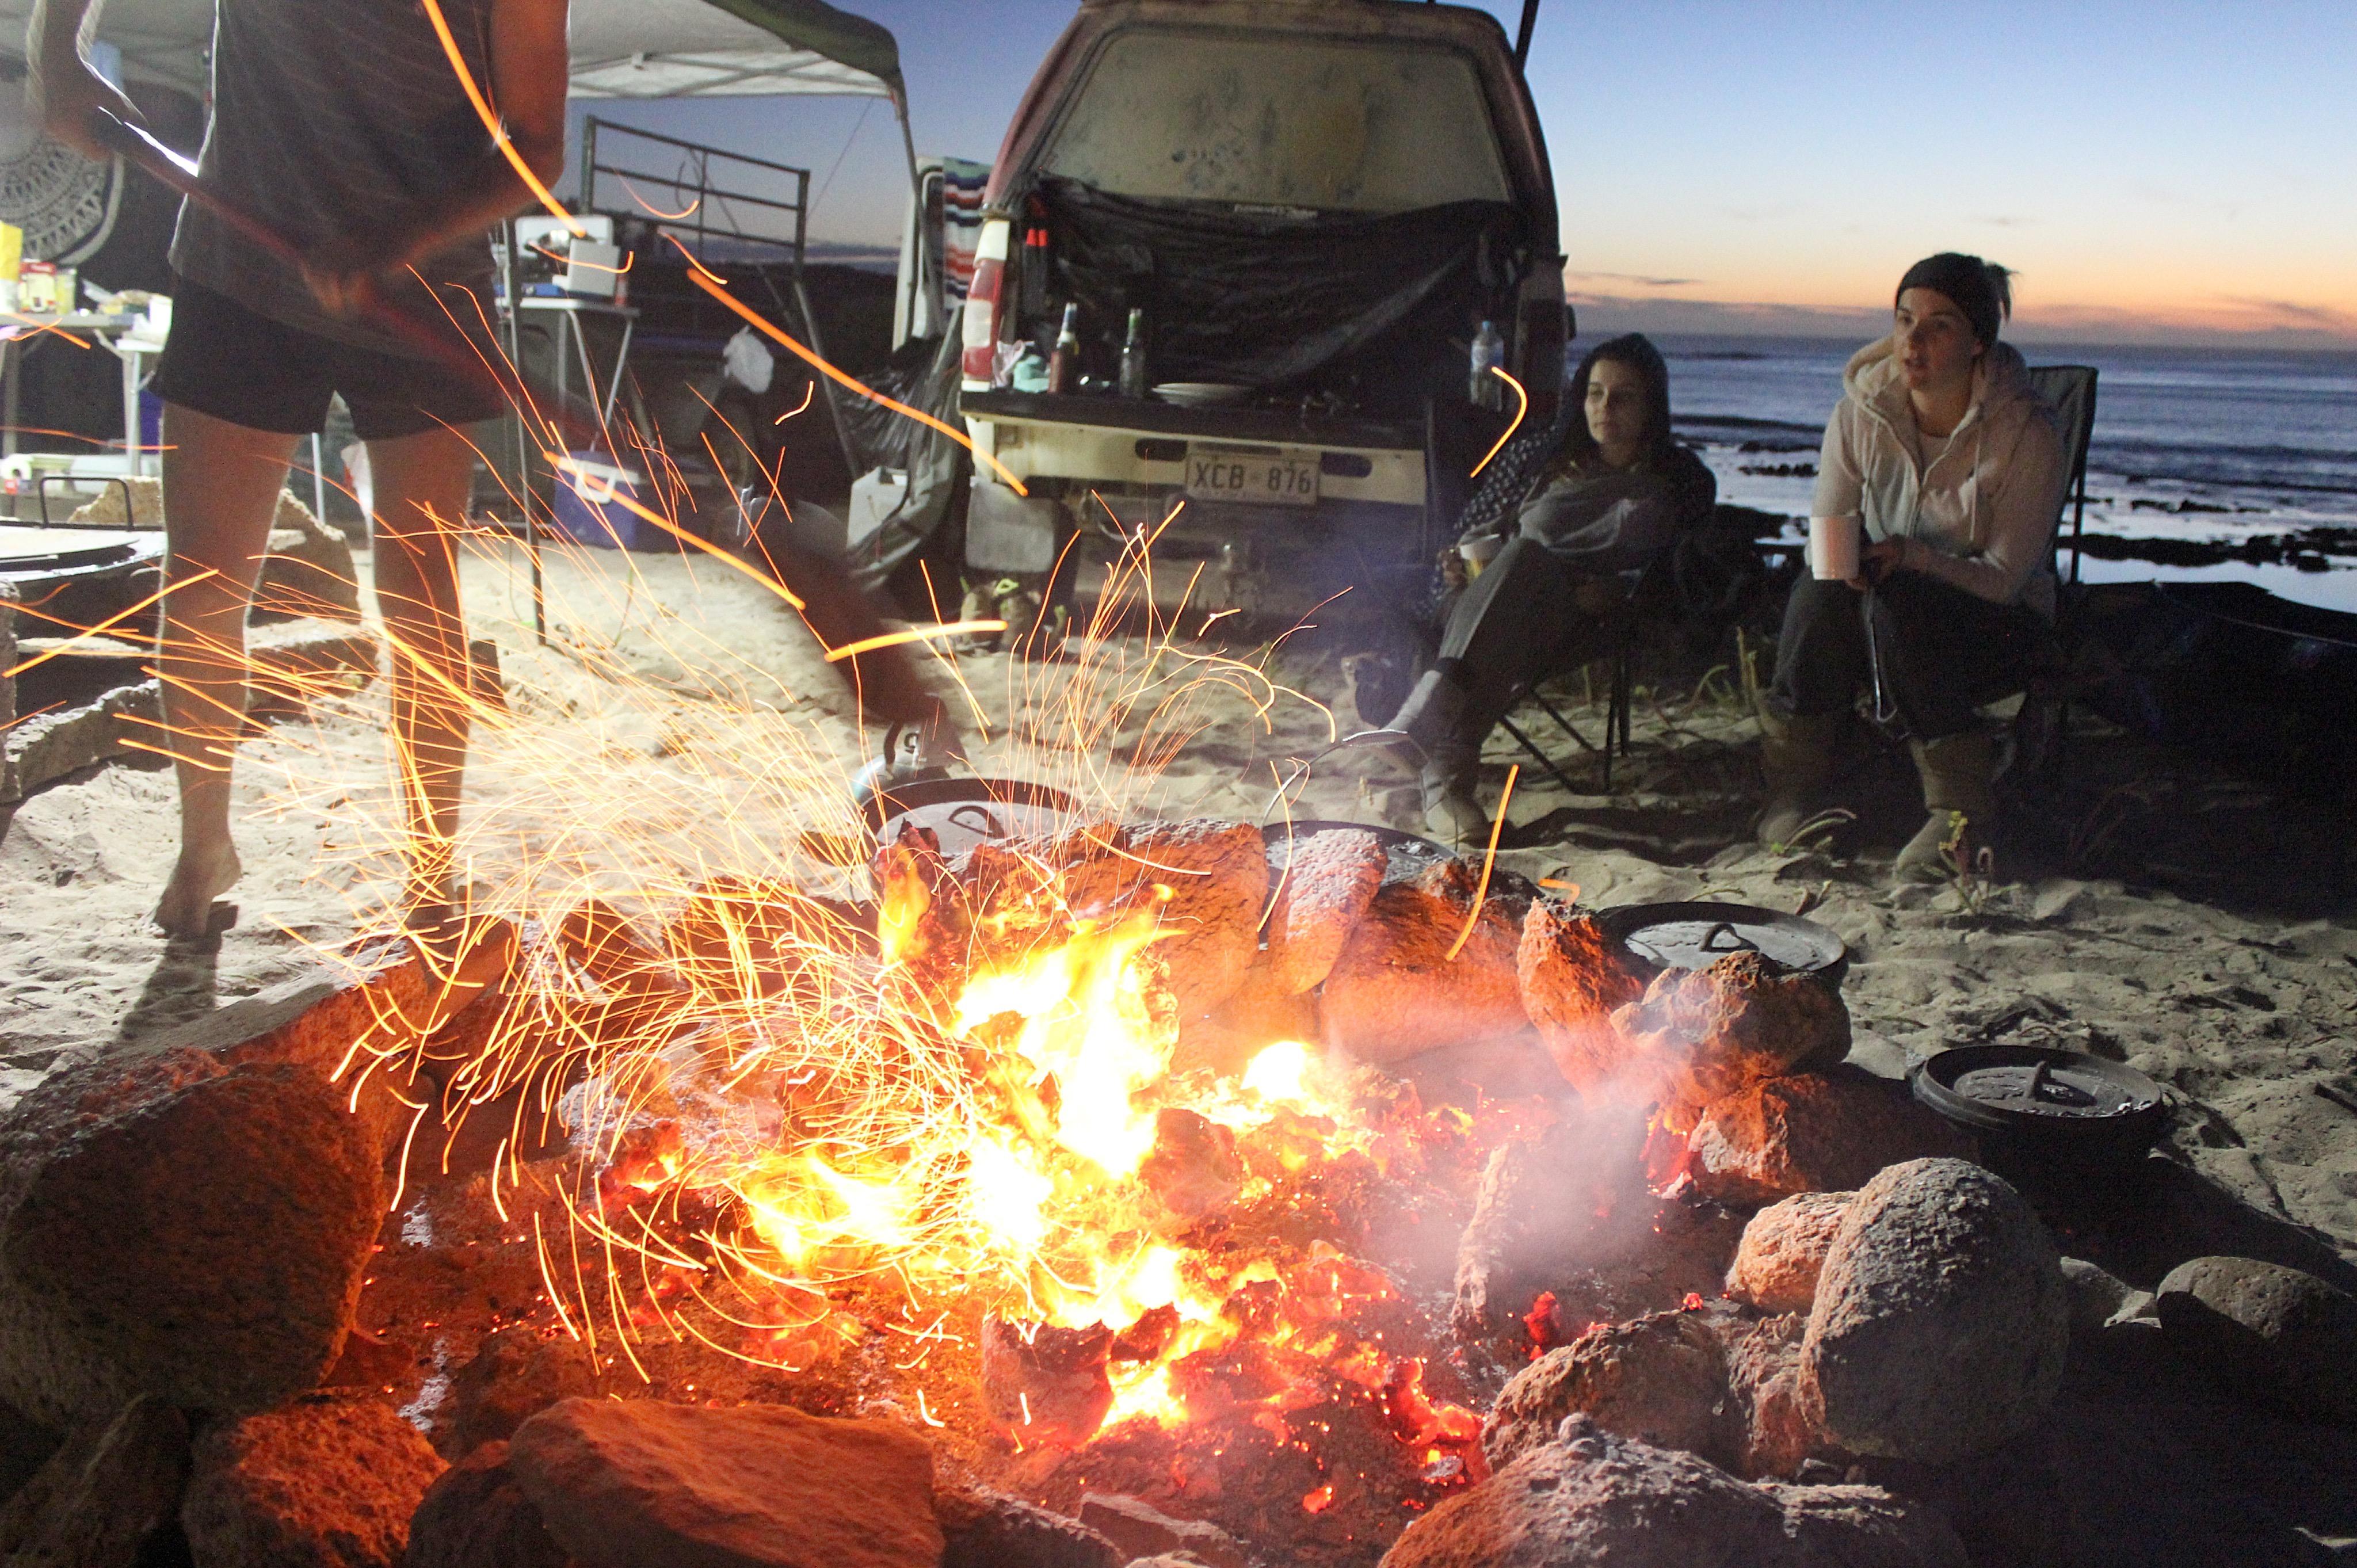 Campfire, SA